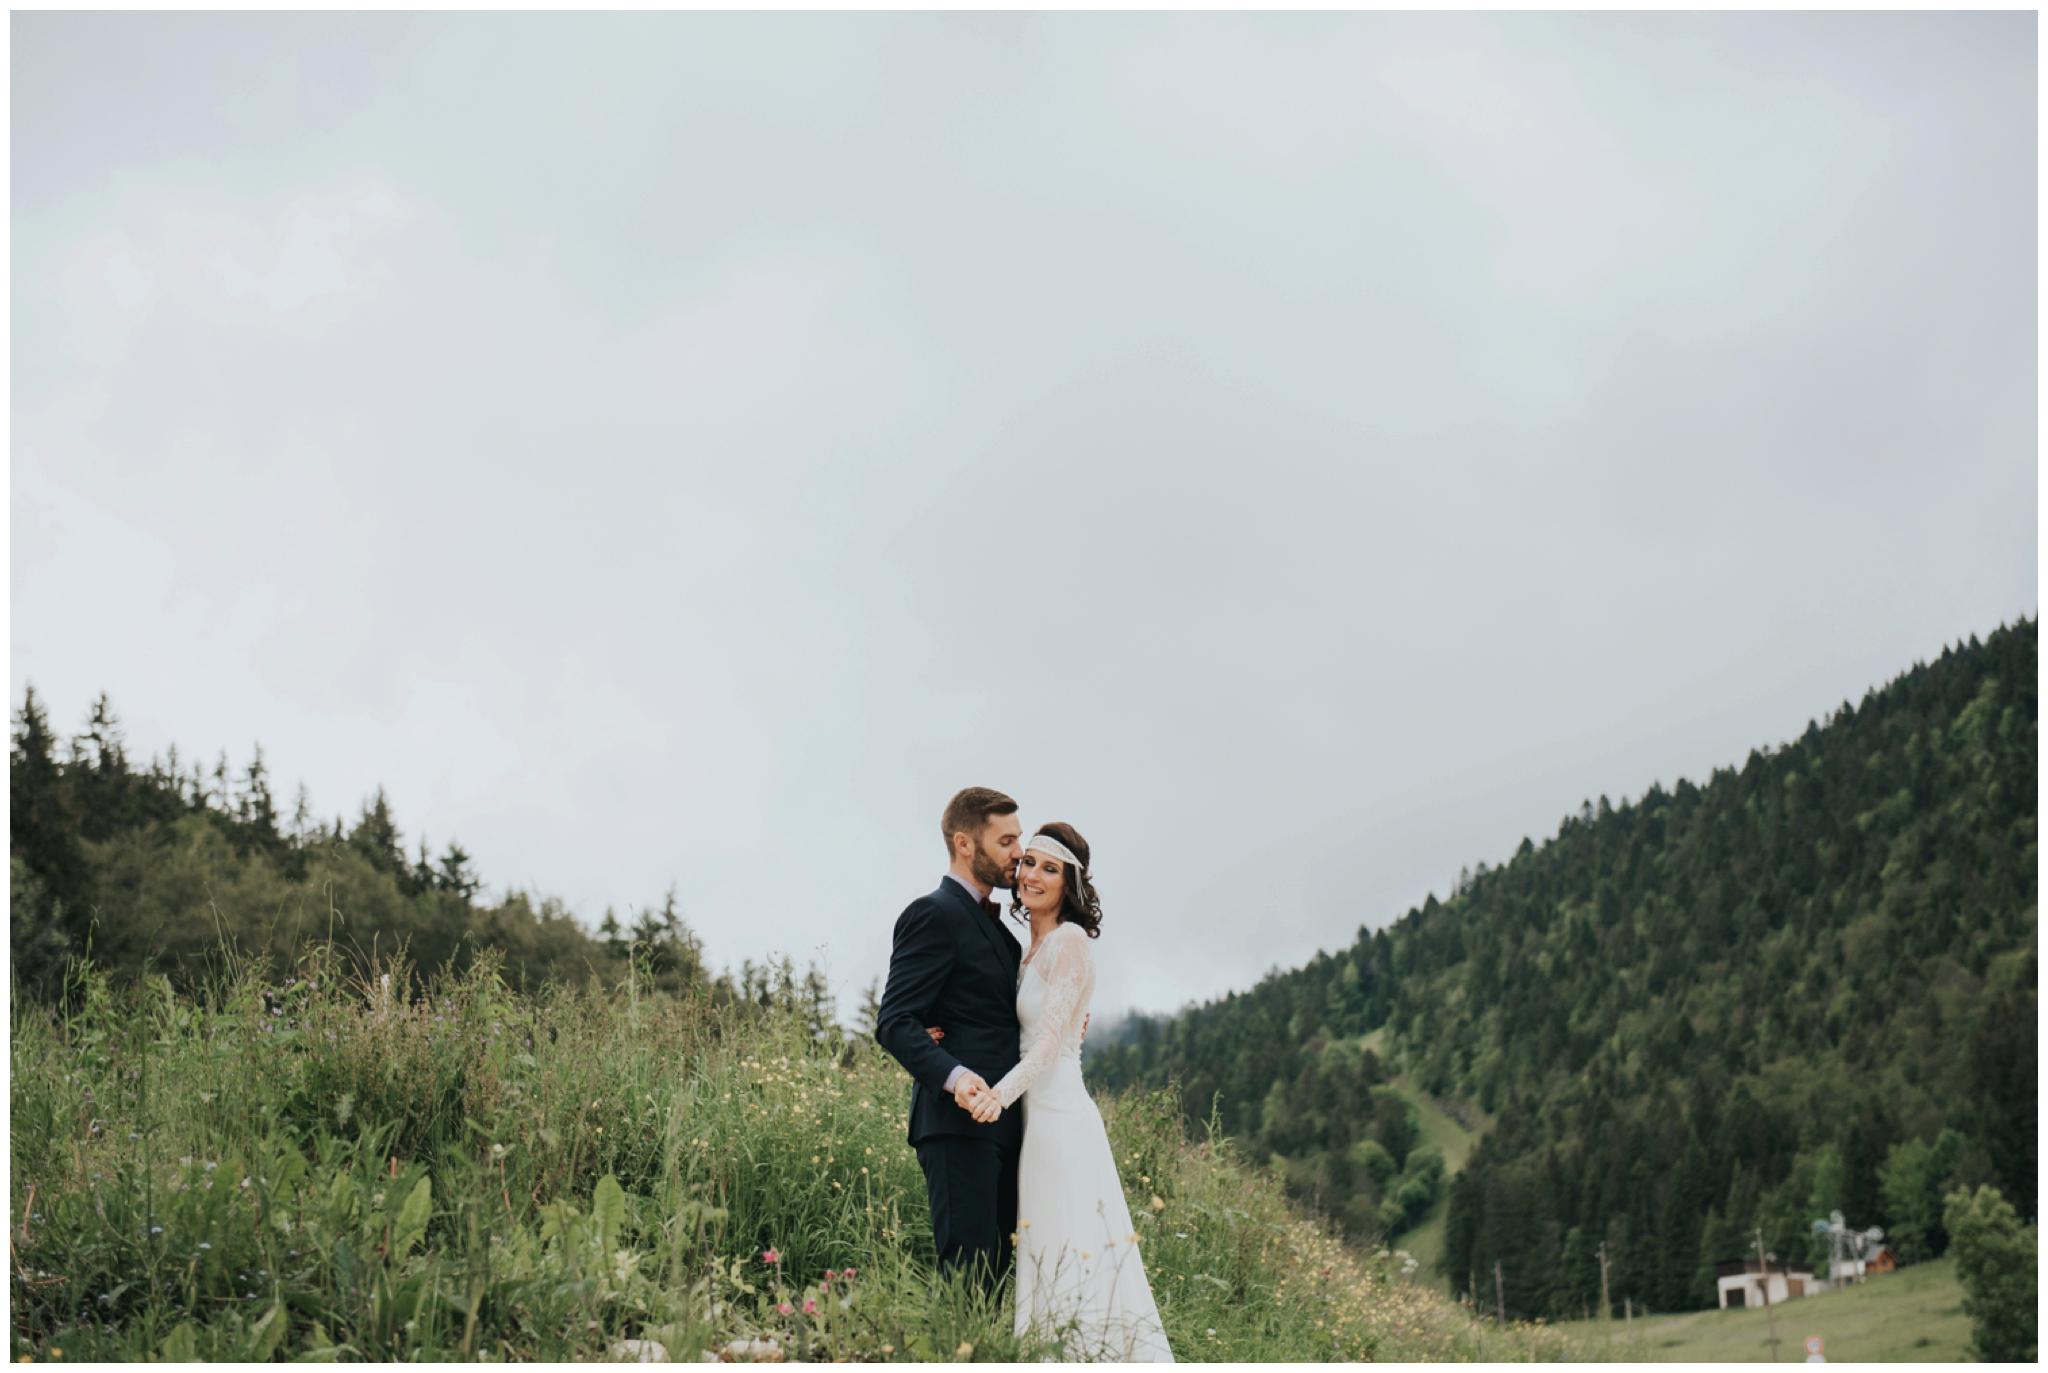 photographe-mariage-montagne-vercors-boho-folk-grenoble-annecy-alpes_0030